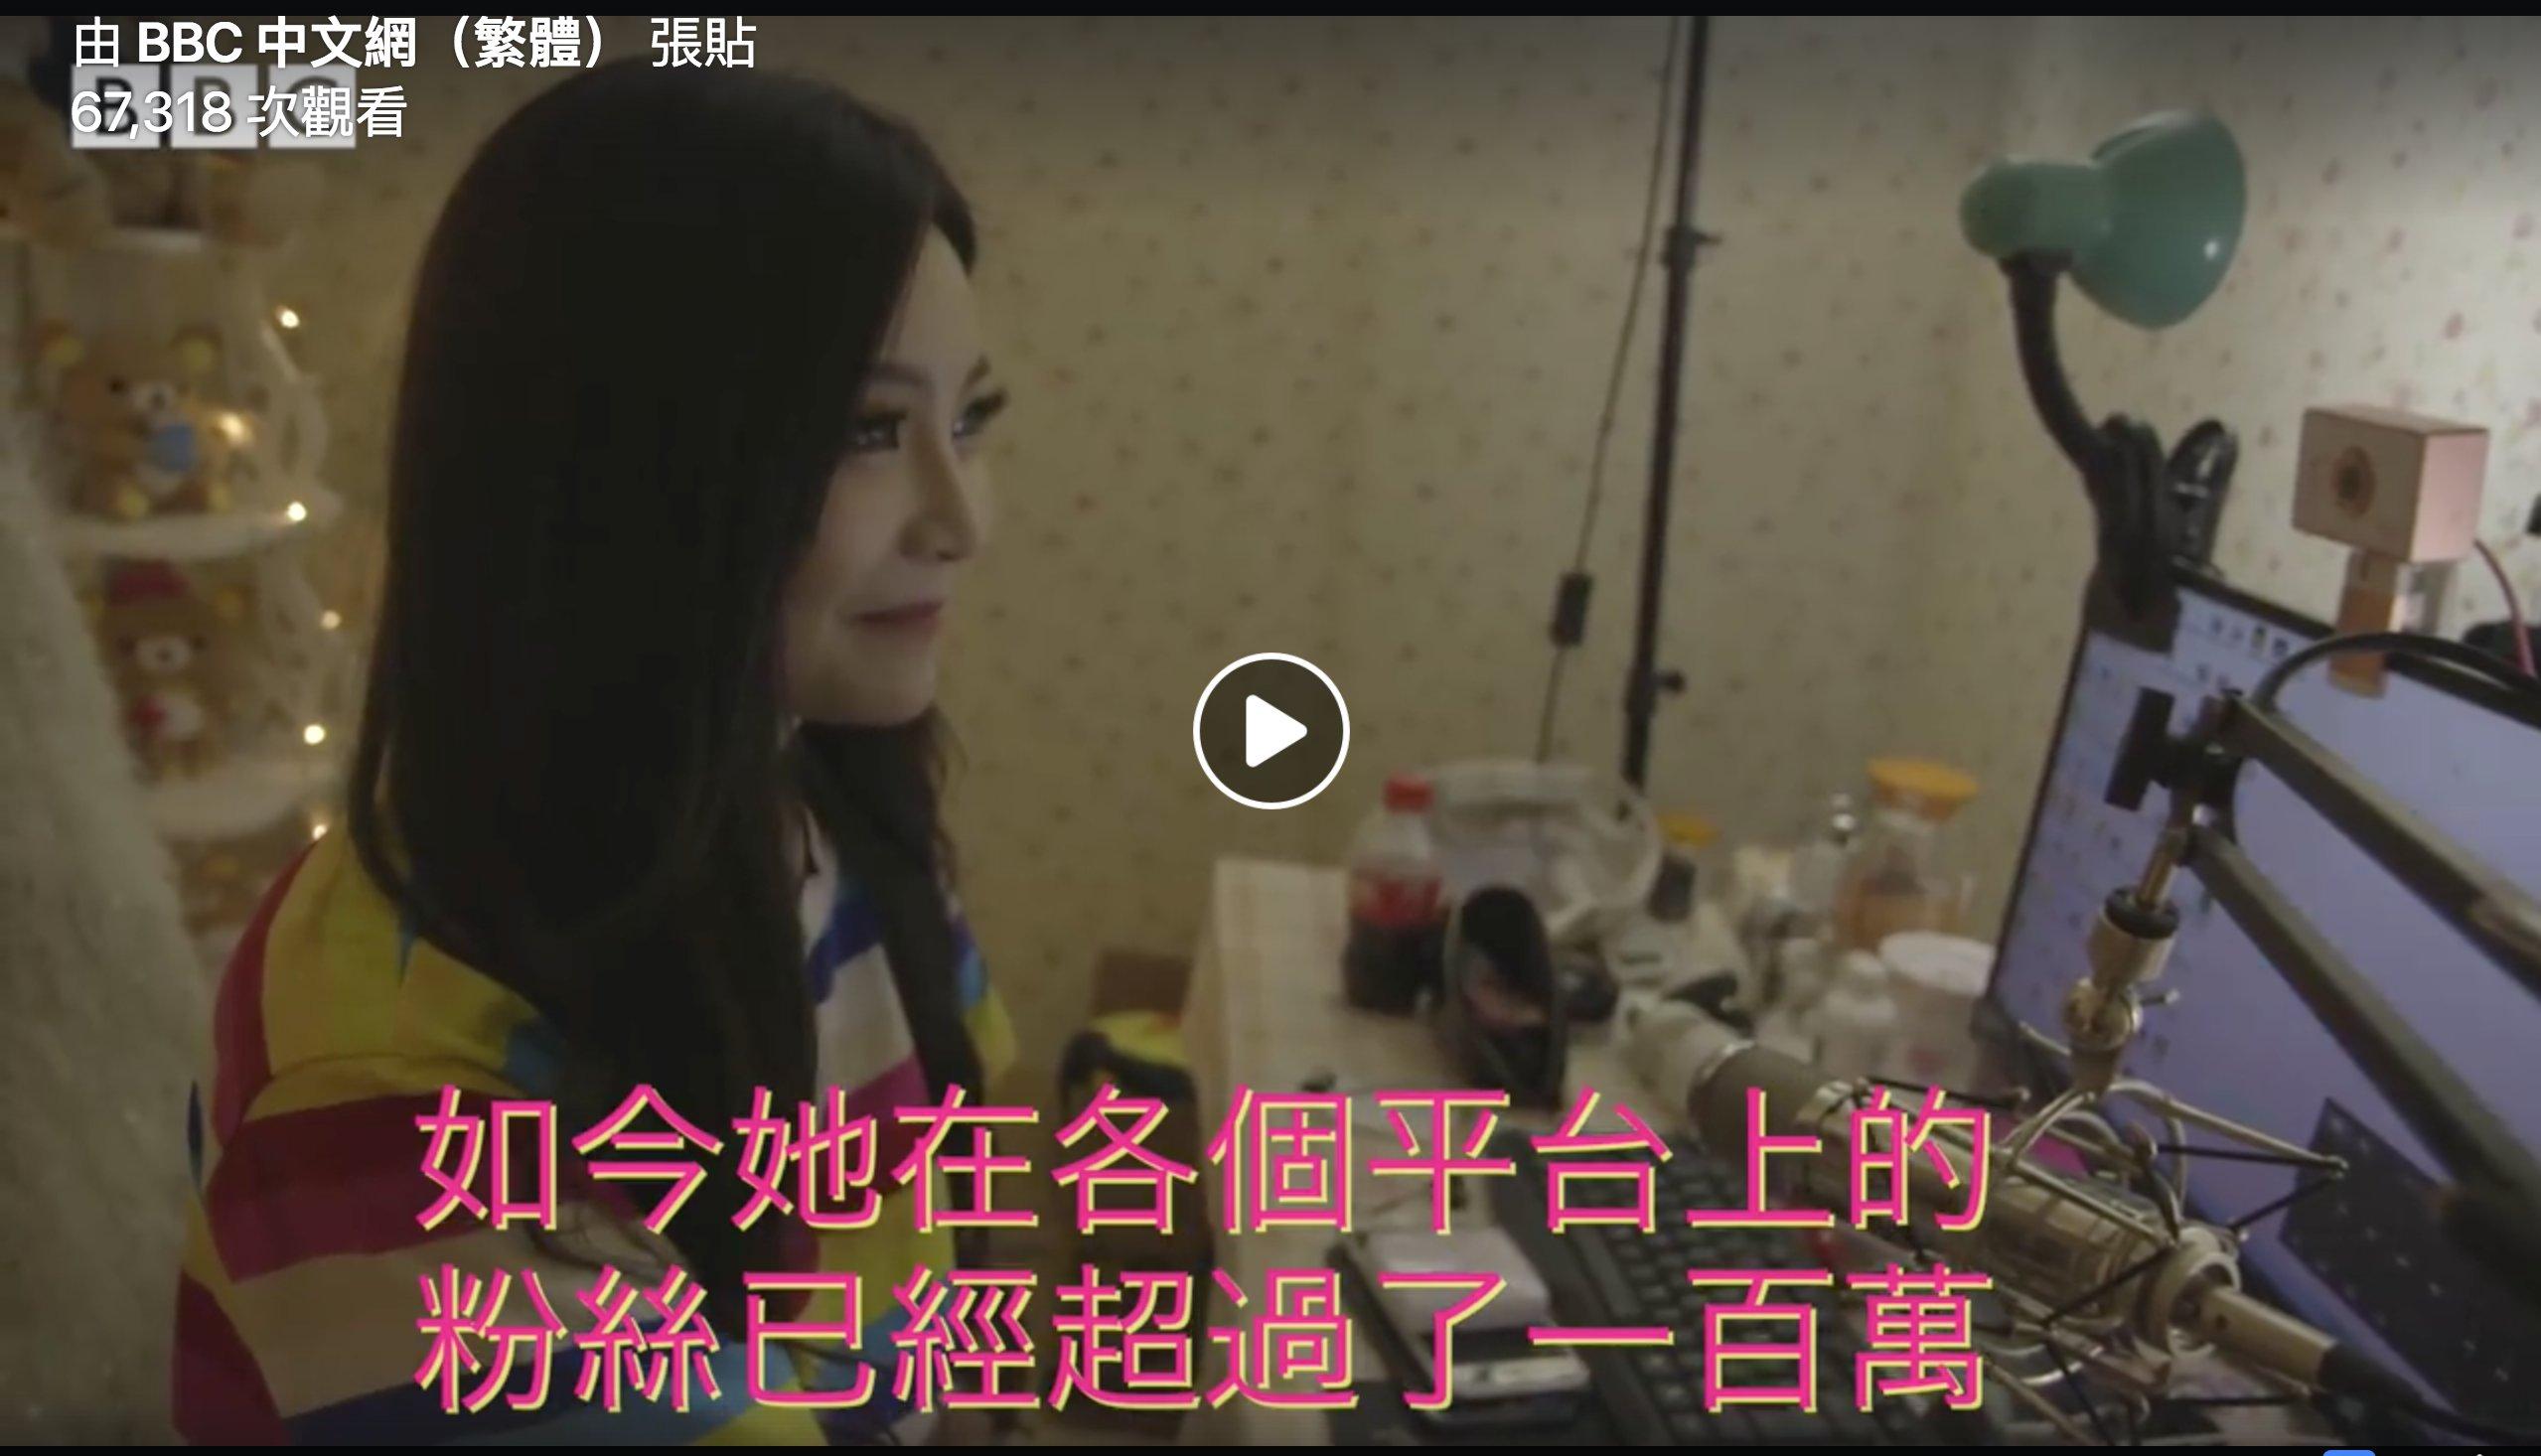 screen shot 2018 10 25 at 3 31 17 pm.png?resize=1200,630 - 直播真的那麼好做?BBC記錄中國網絡女主播背後的辛酸故事「直播主的人生」!